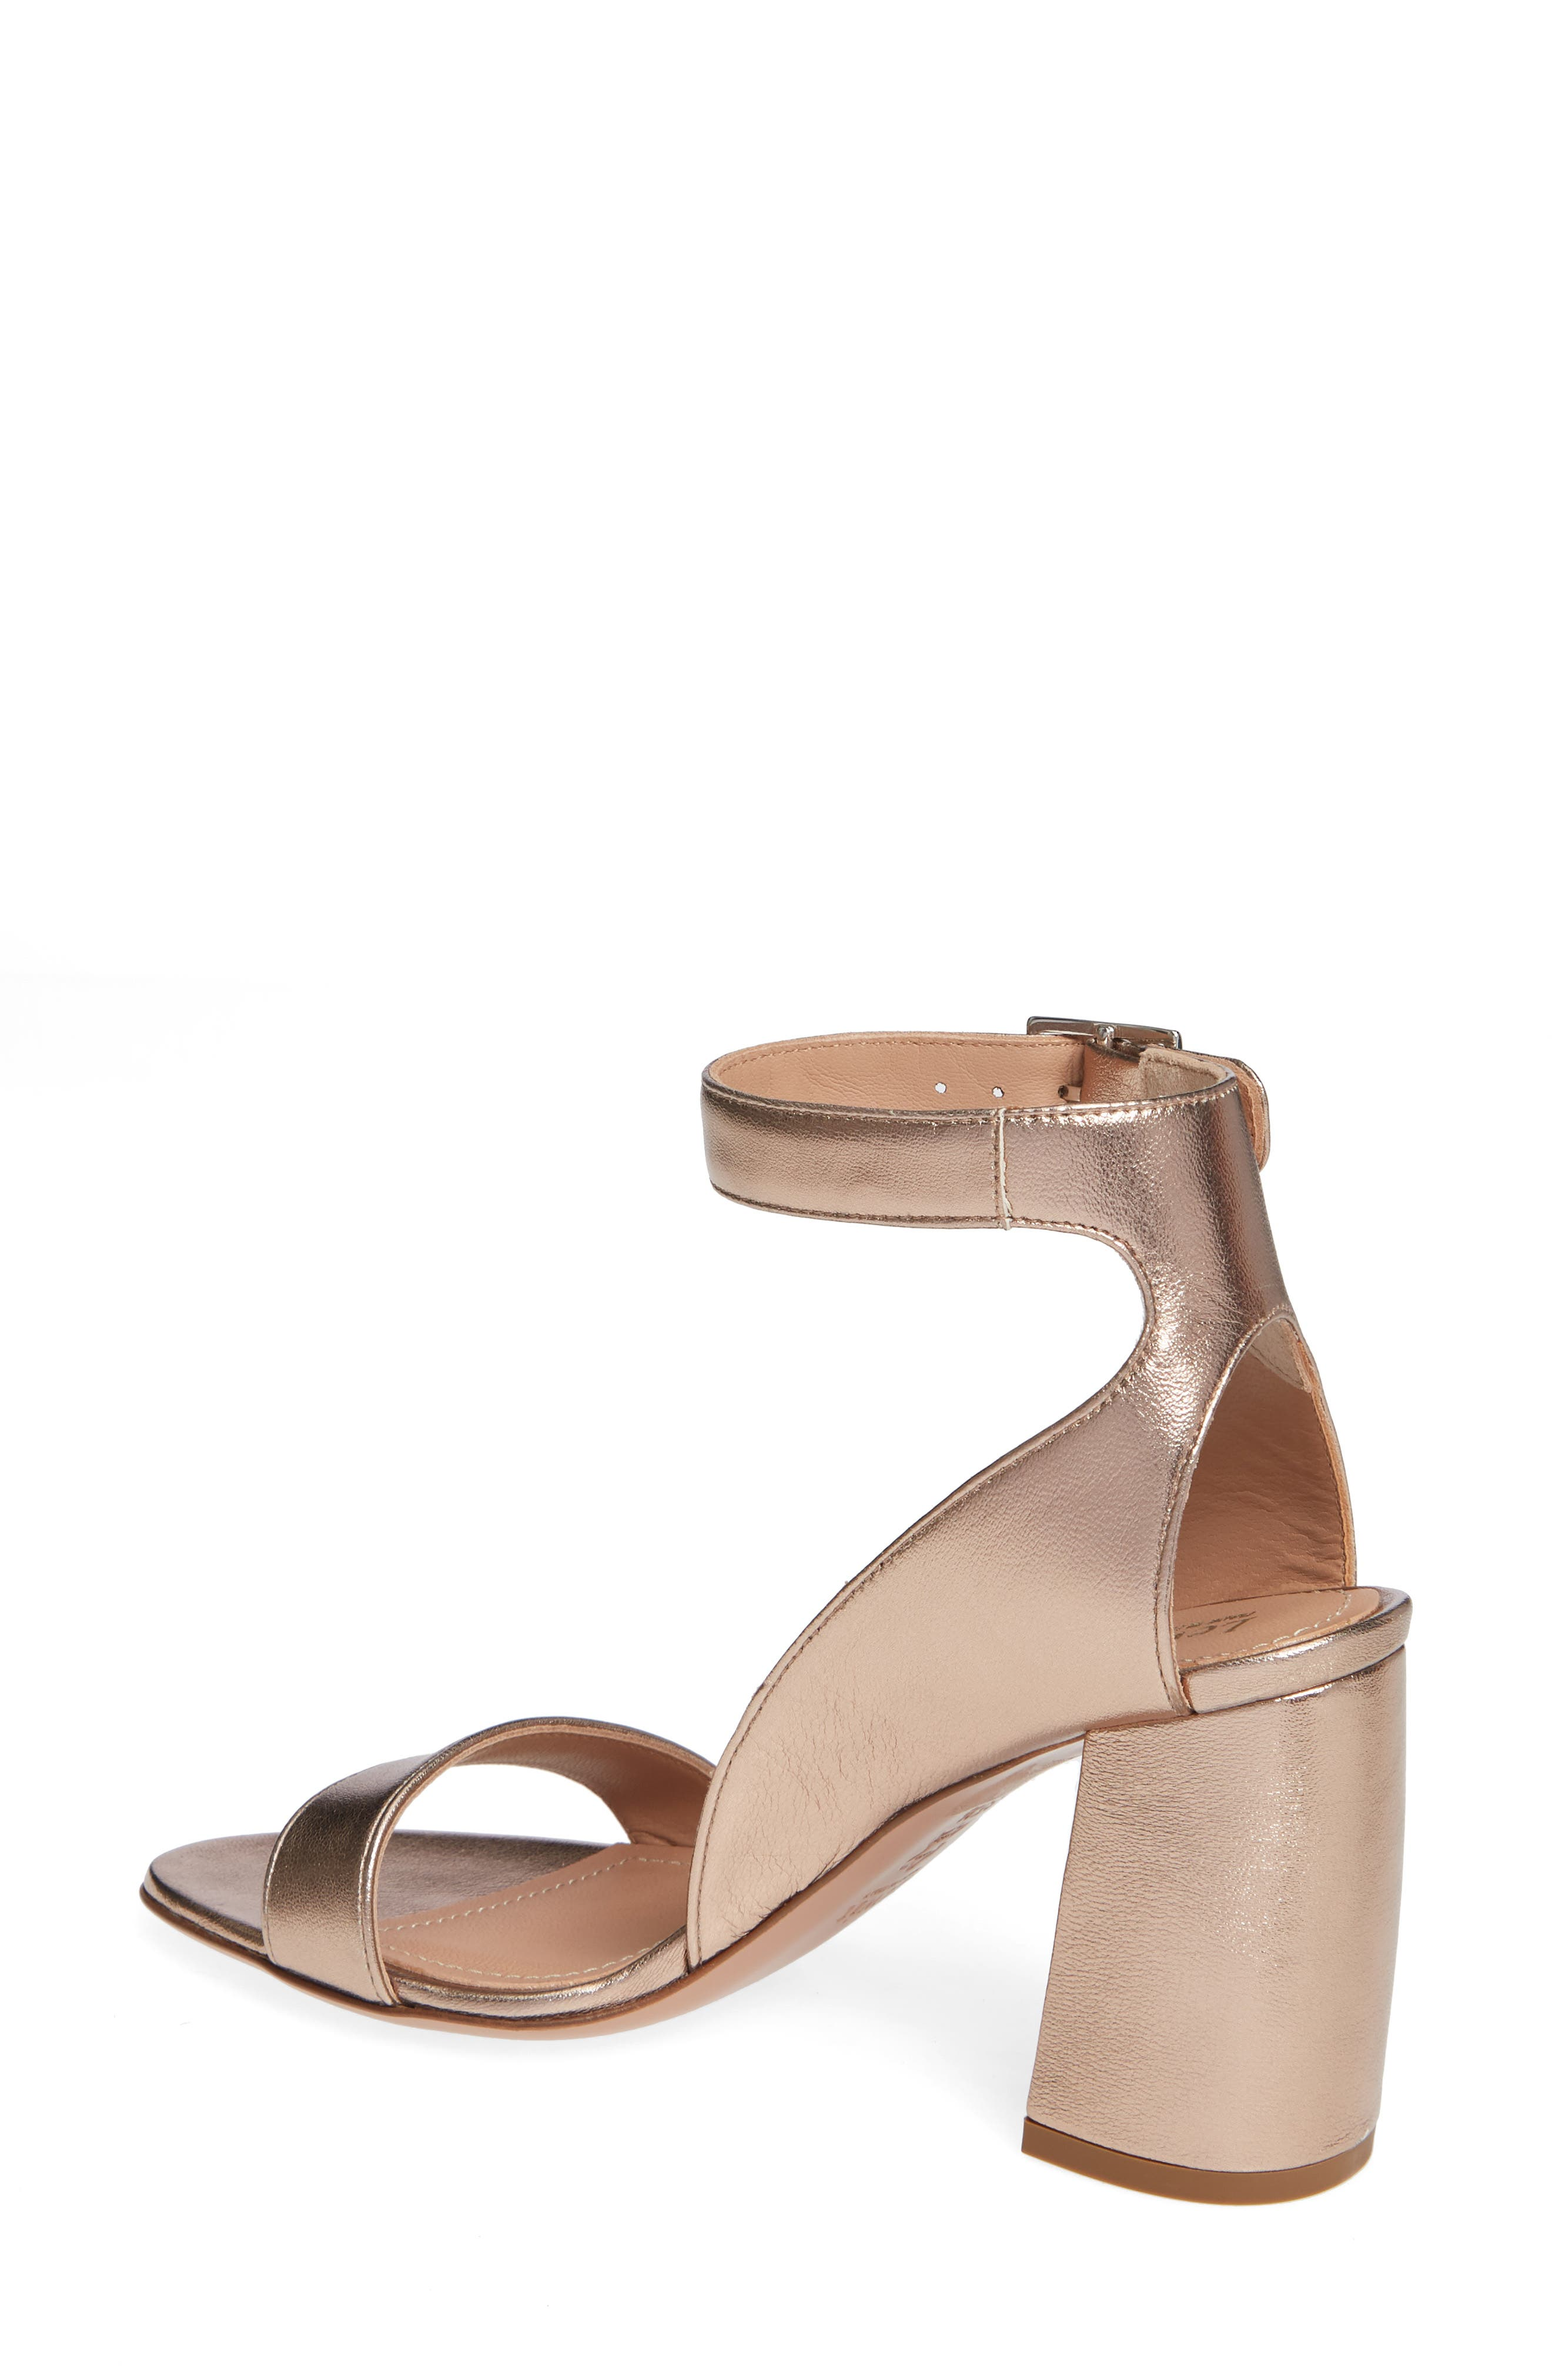 Guilia Block Heel Sandal,                             Alternate thumbnail 2, color,                             BRONZE LEATHER